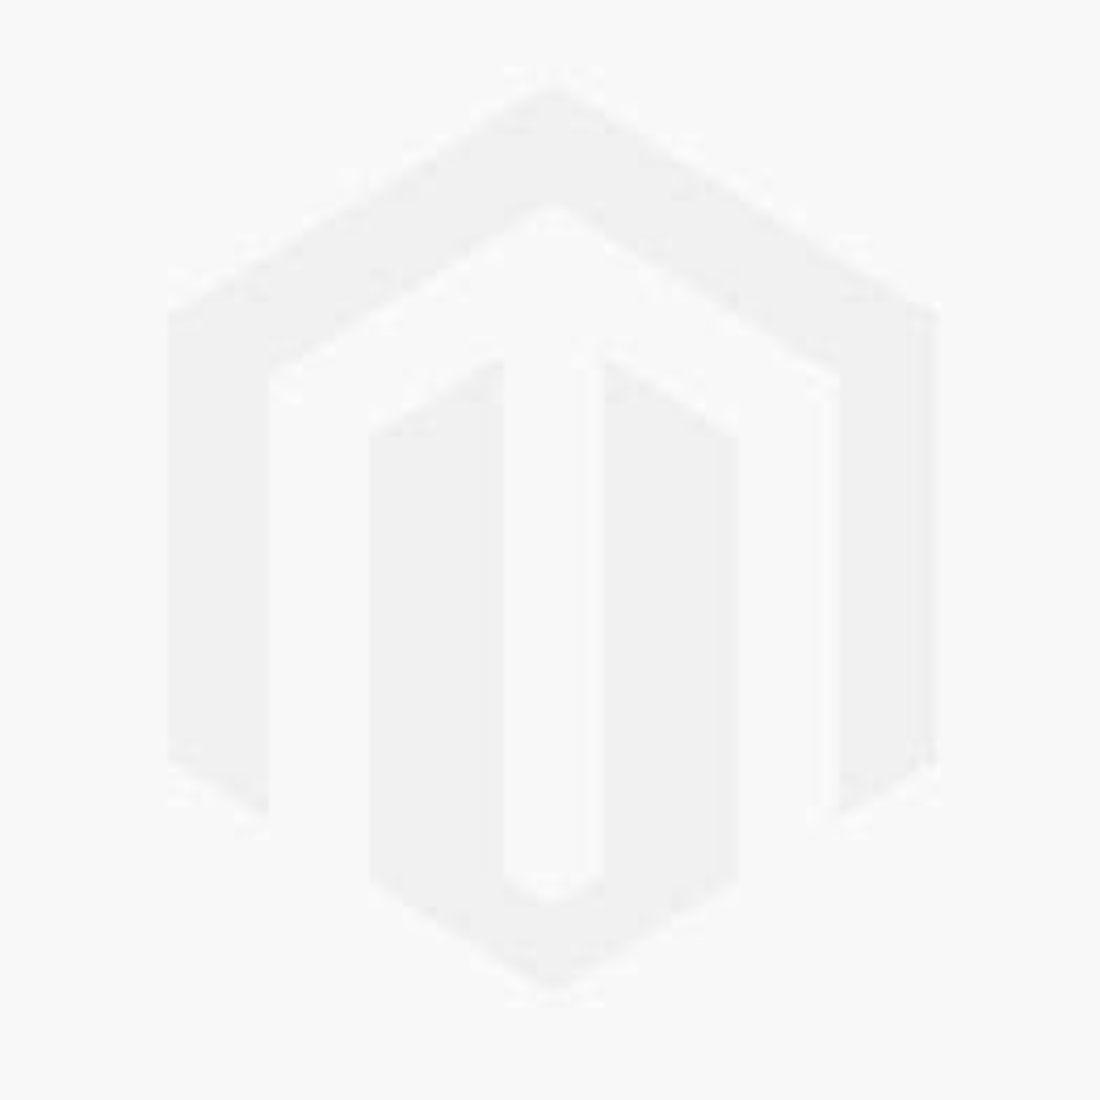 Albert Irvin OBE RA Untitled opus w.34